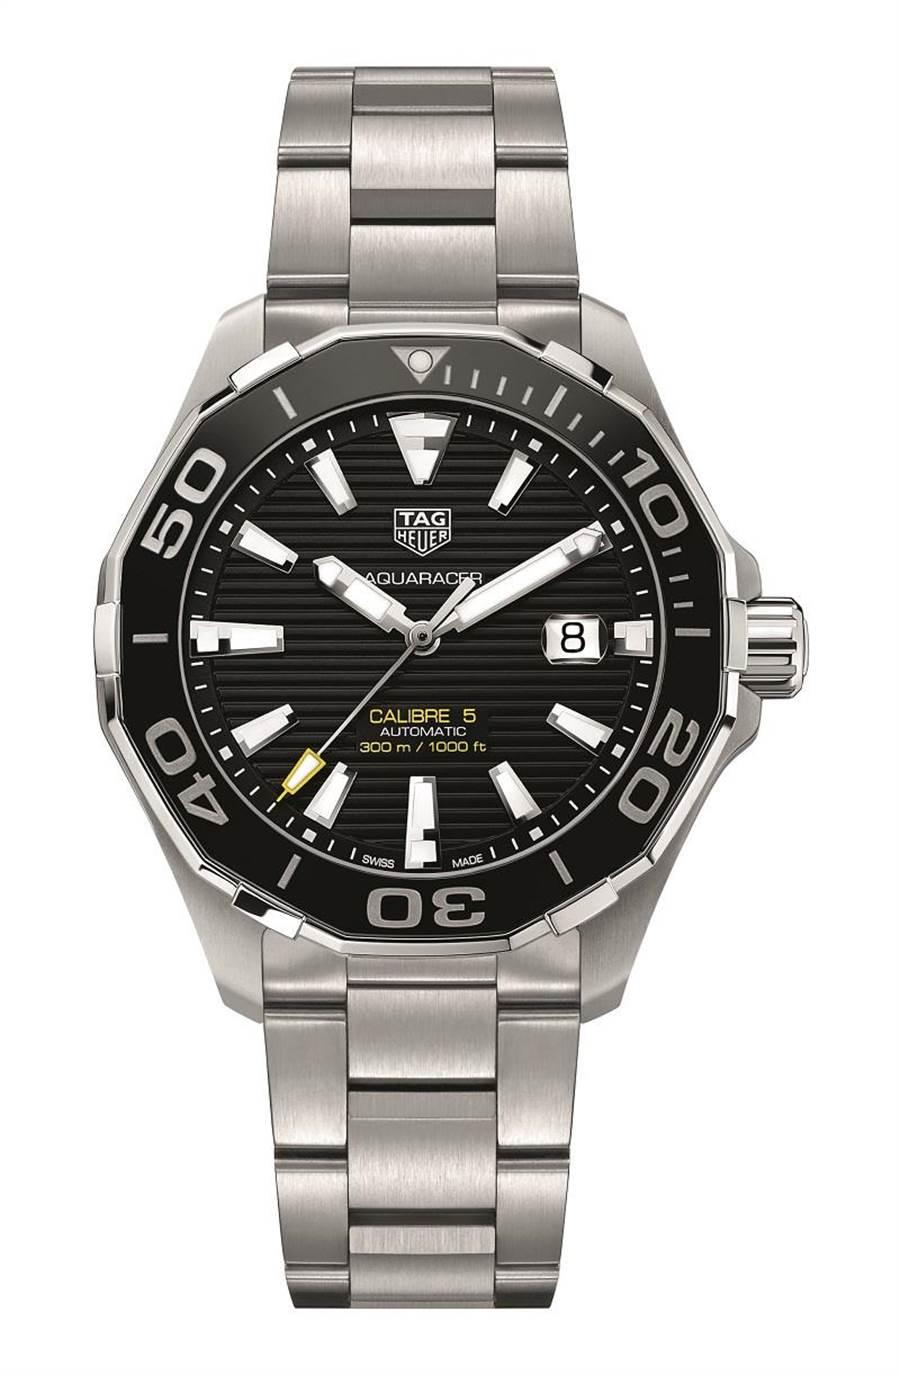 泰格豪雅Aquaracer Calibre5腕表,8萬7400元。(TAG Heuer提供)